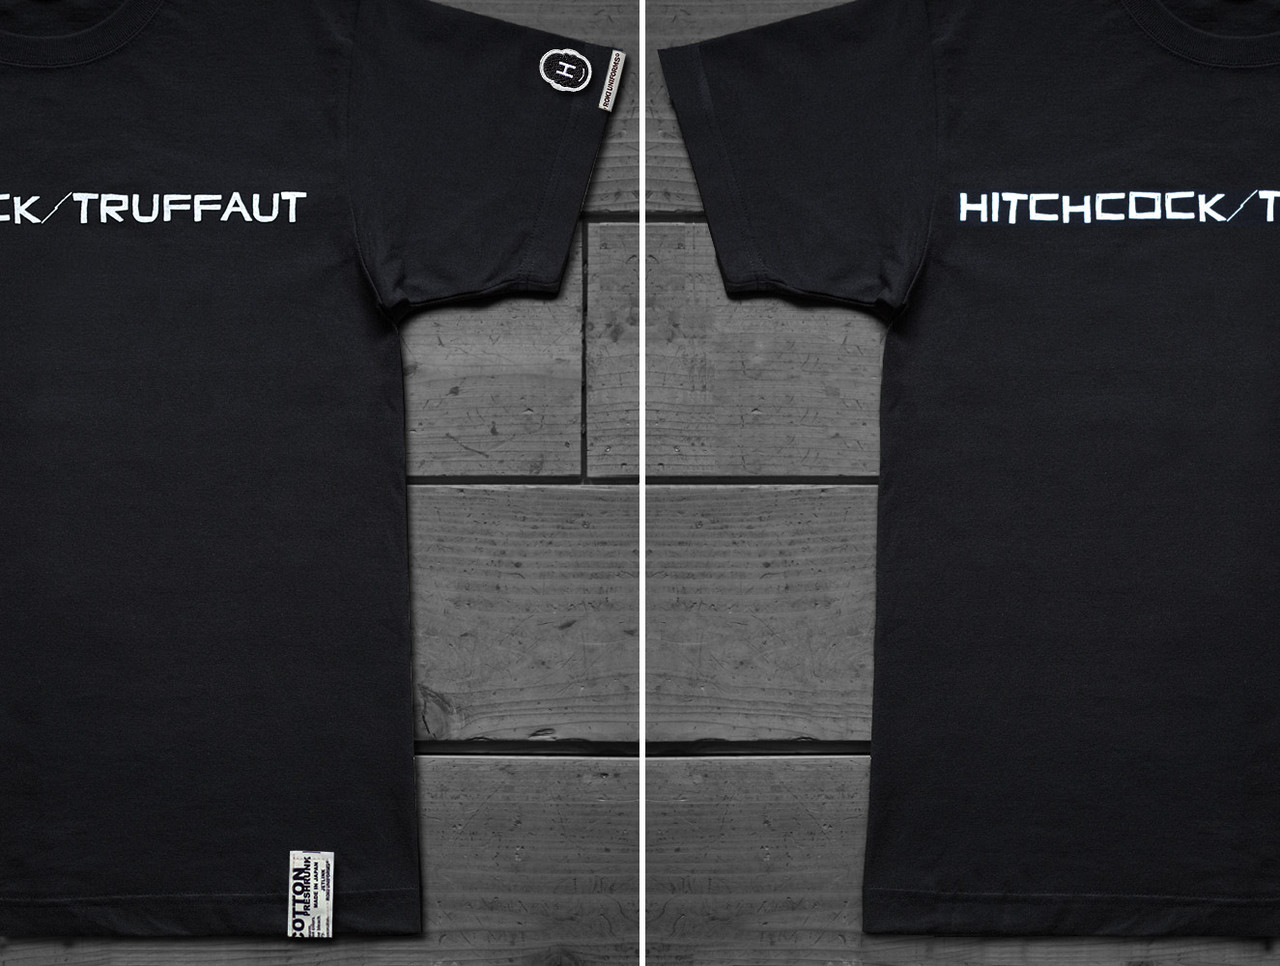 hitch2c